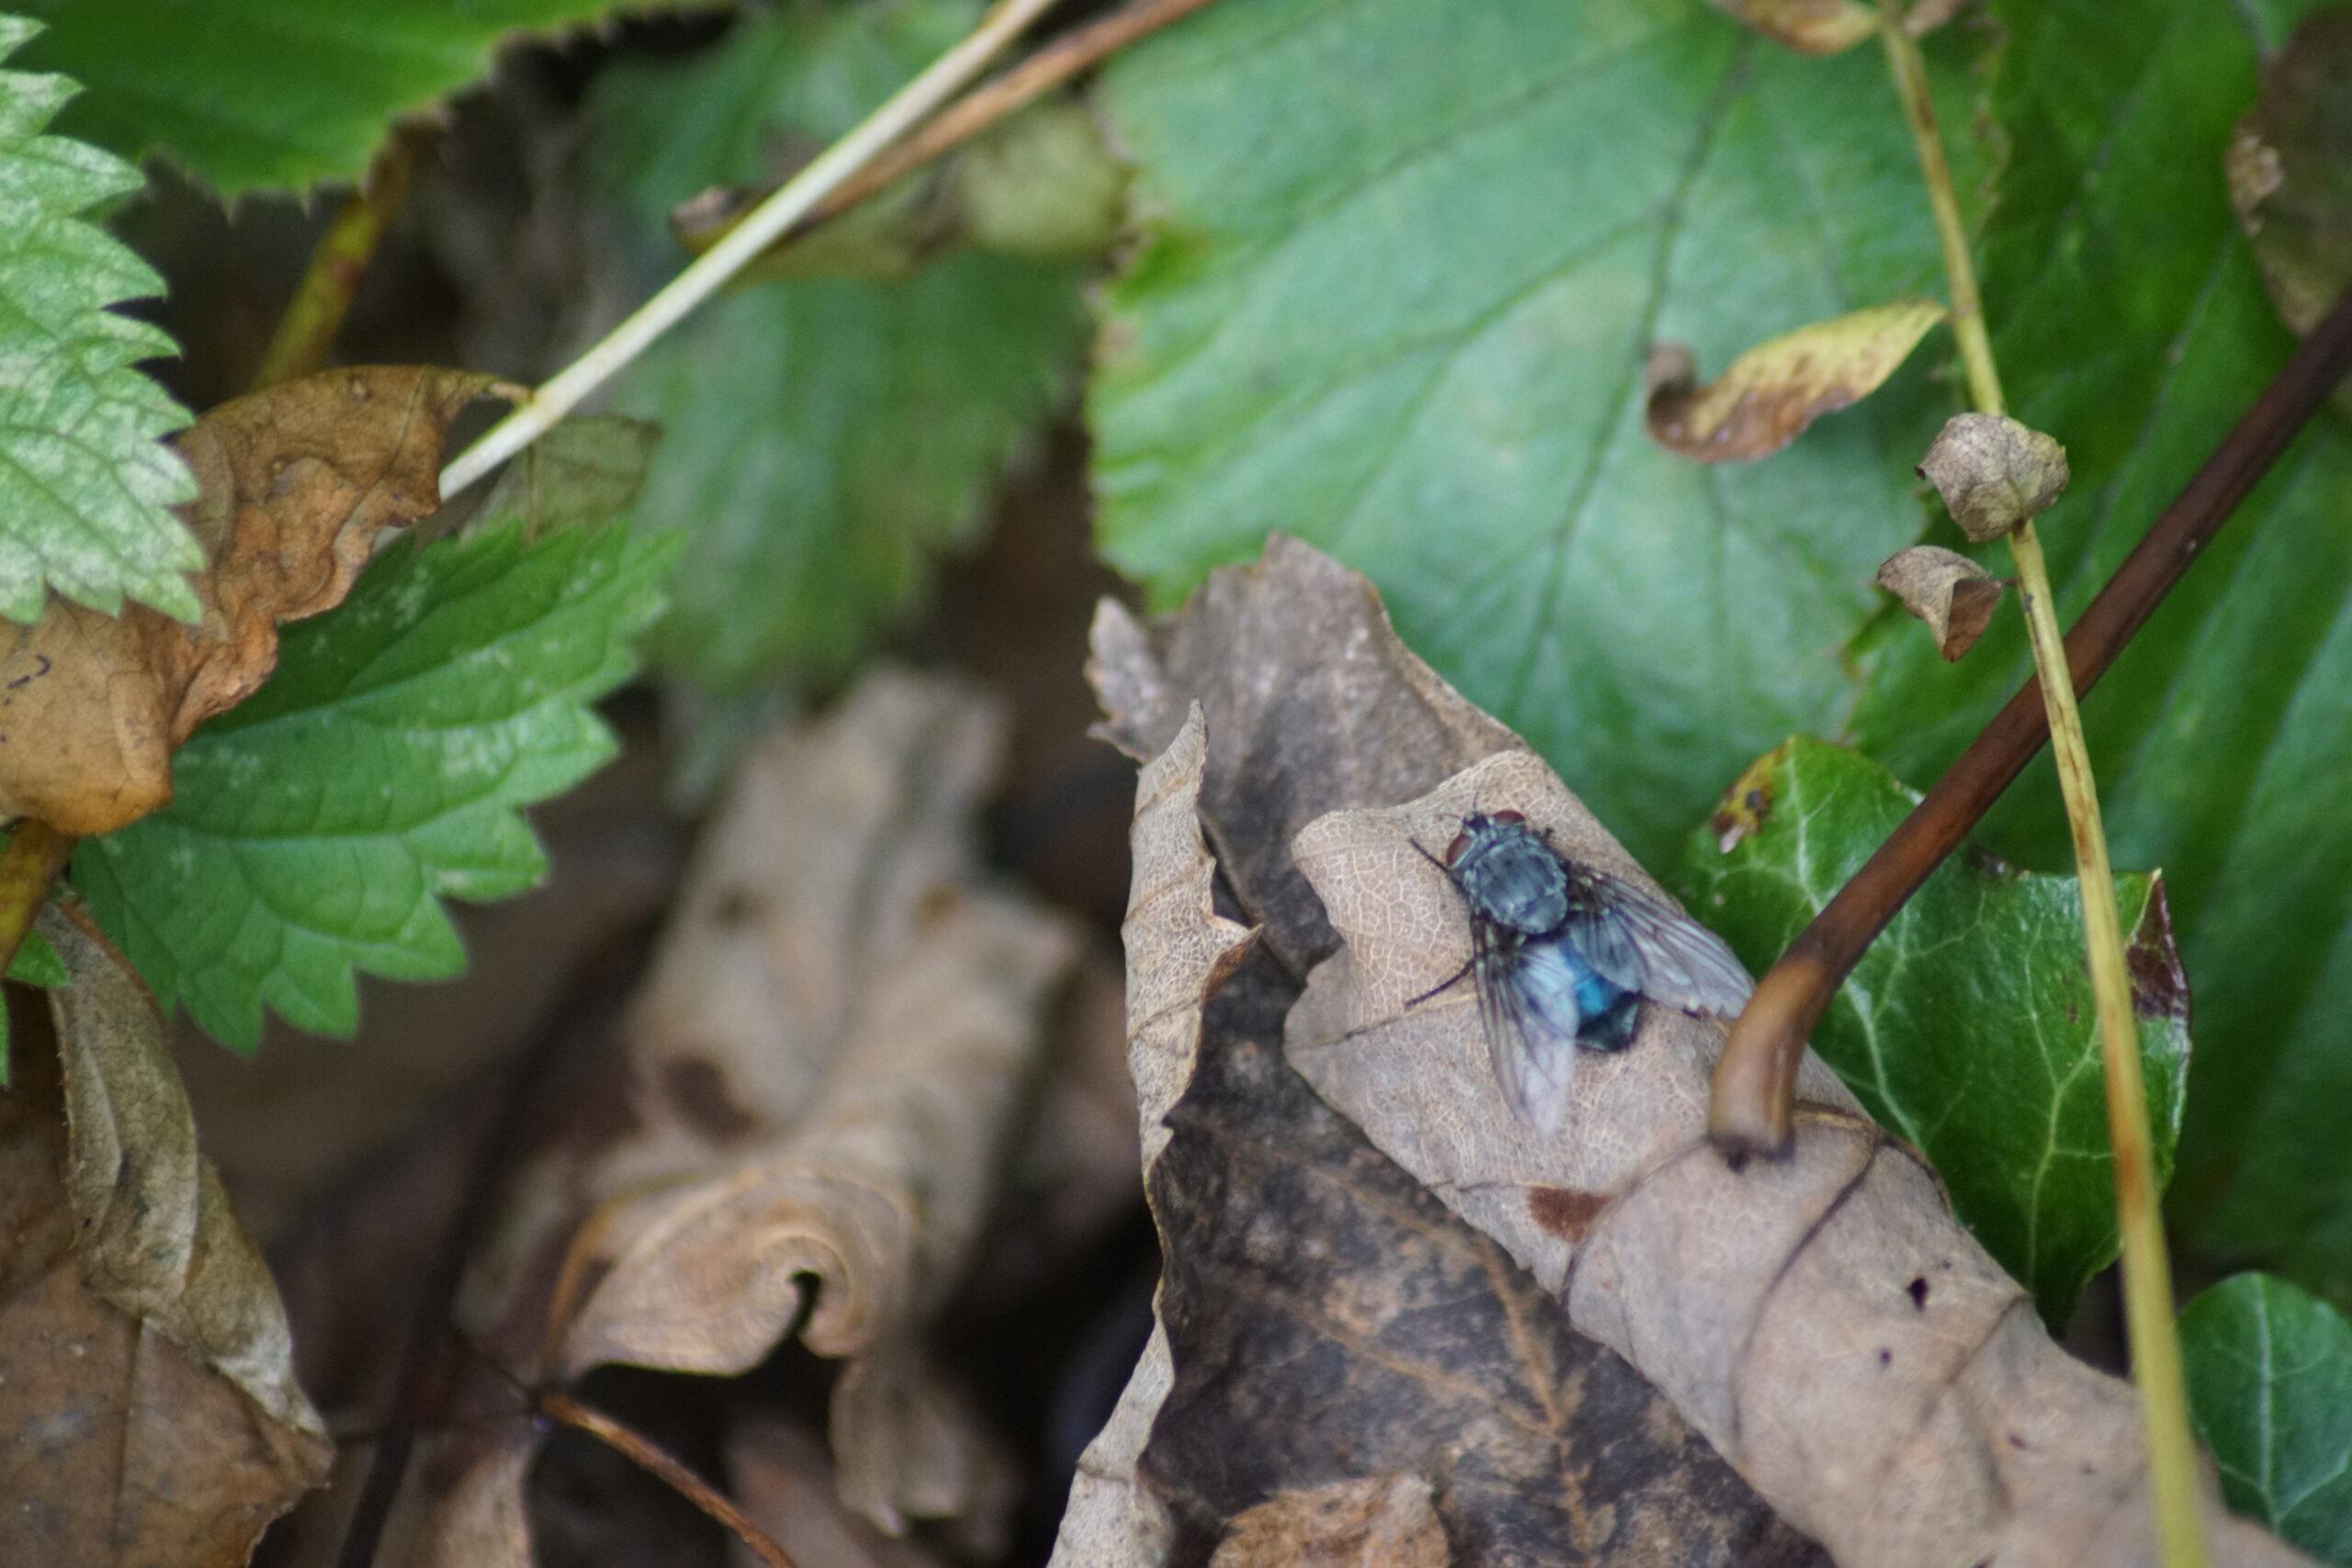 Bluebottle  - possibly Calliphora vicina